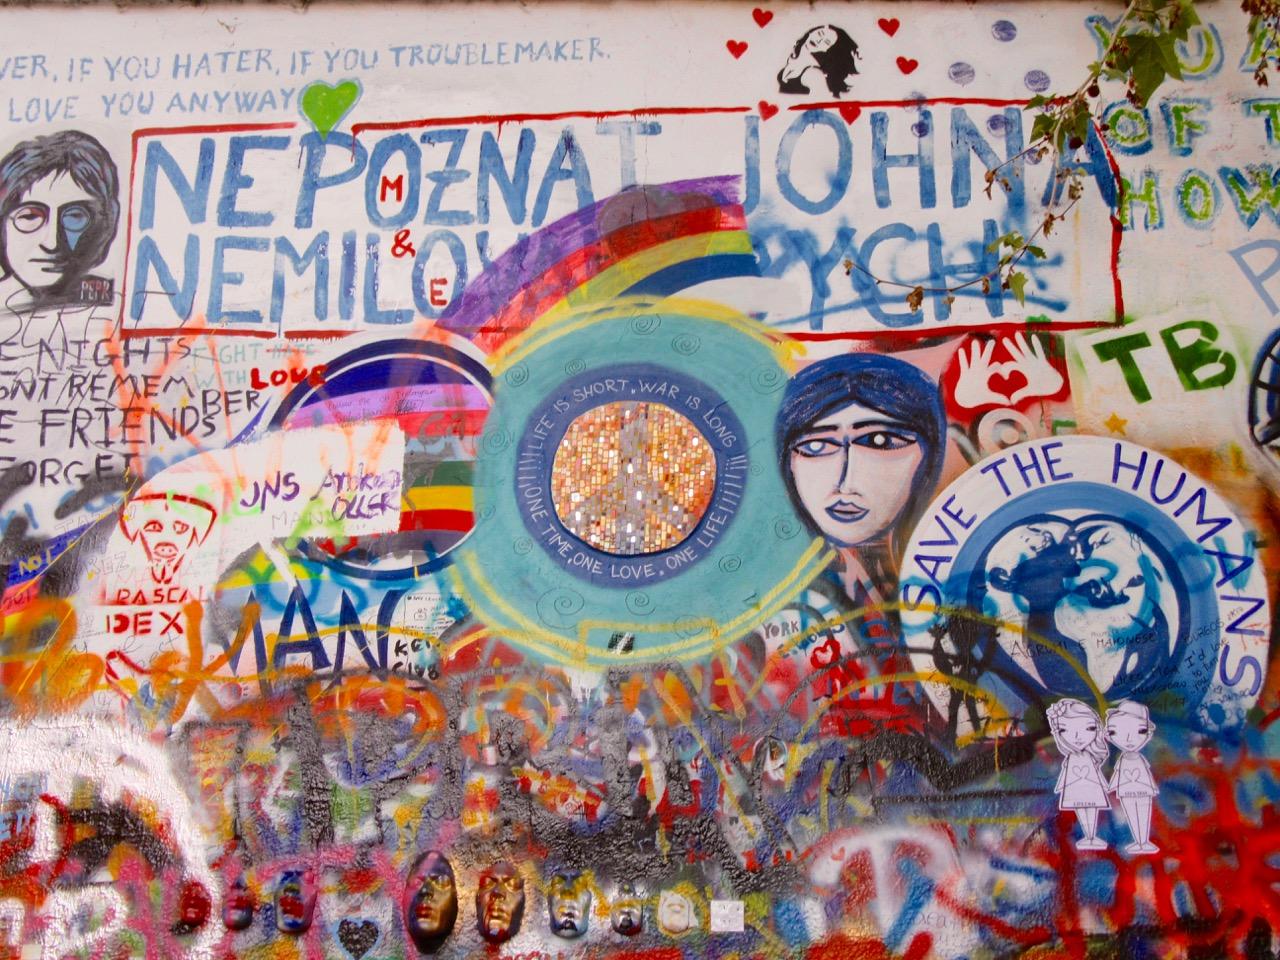 A portion of the John Lennon Wall in Prague.